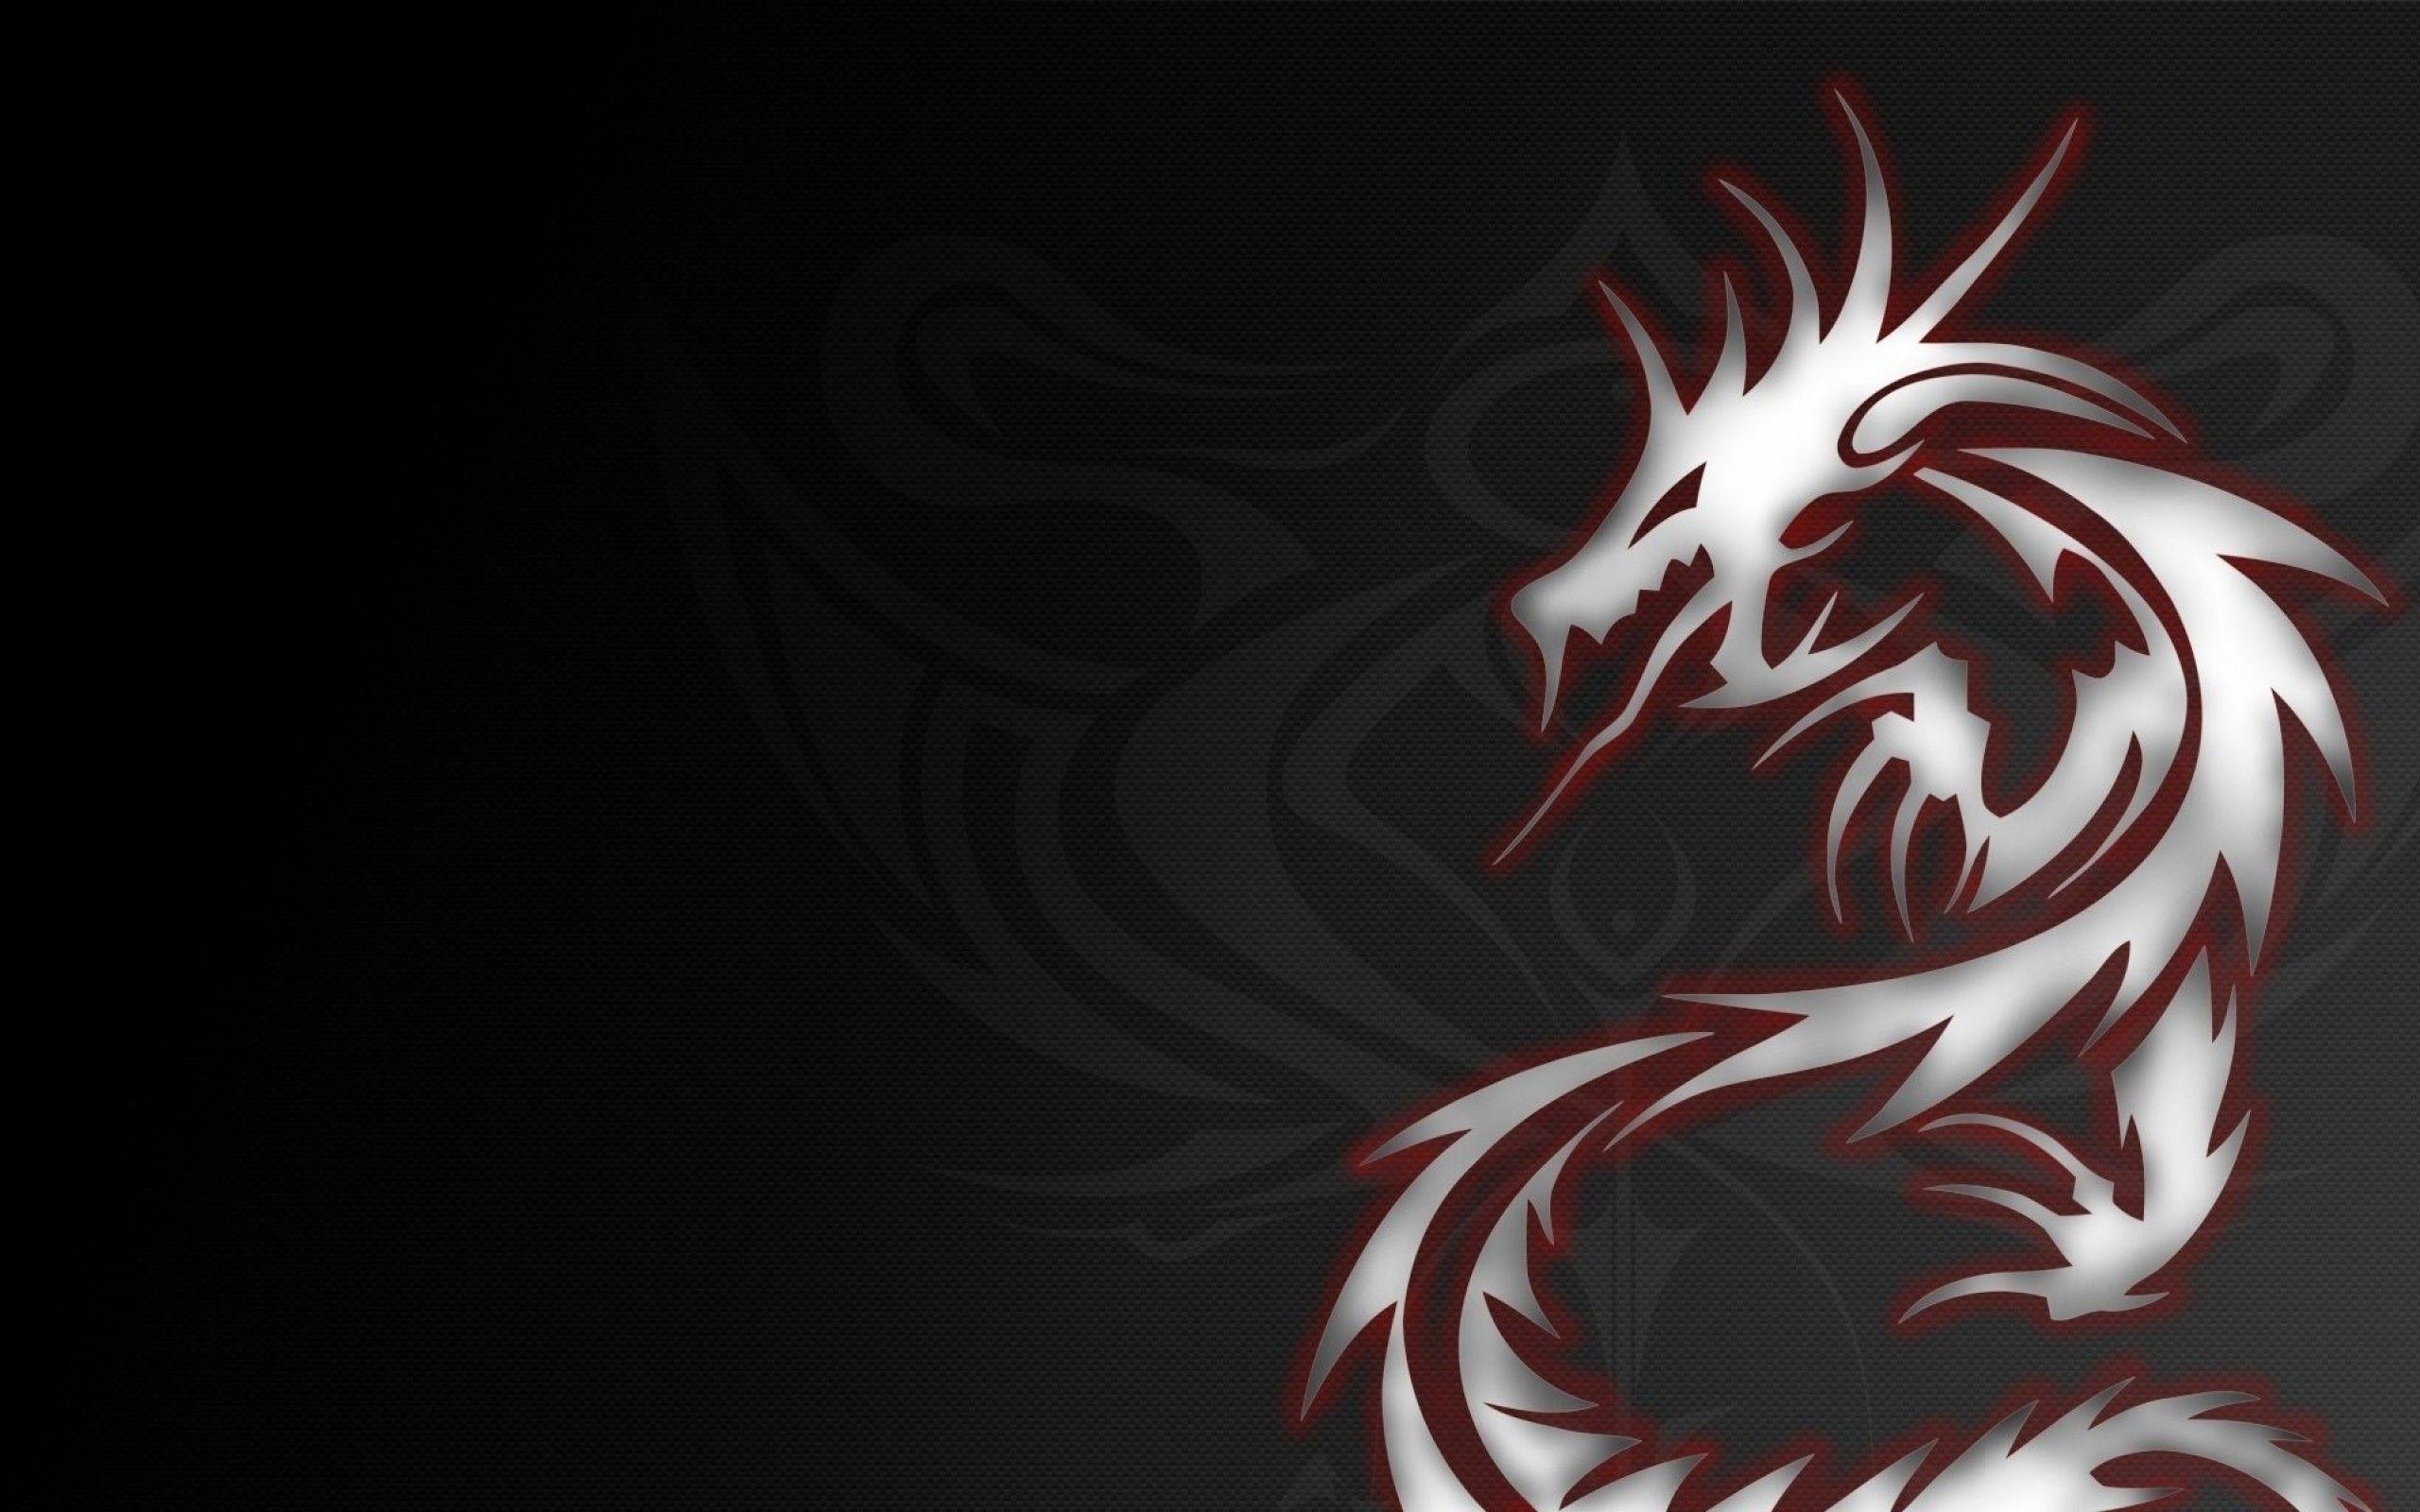 Download Dragon Art Tattoo Black Wallpaper Images HD Free Desktop .